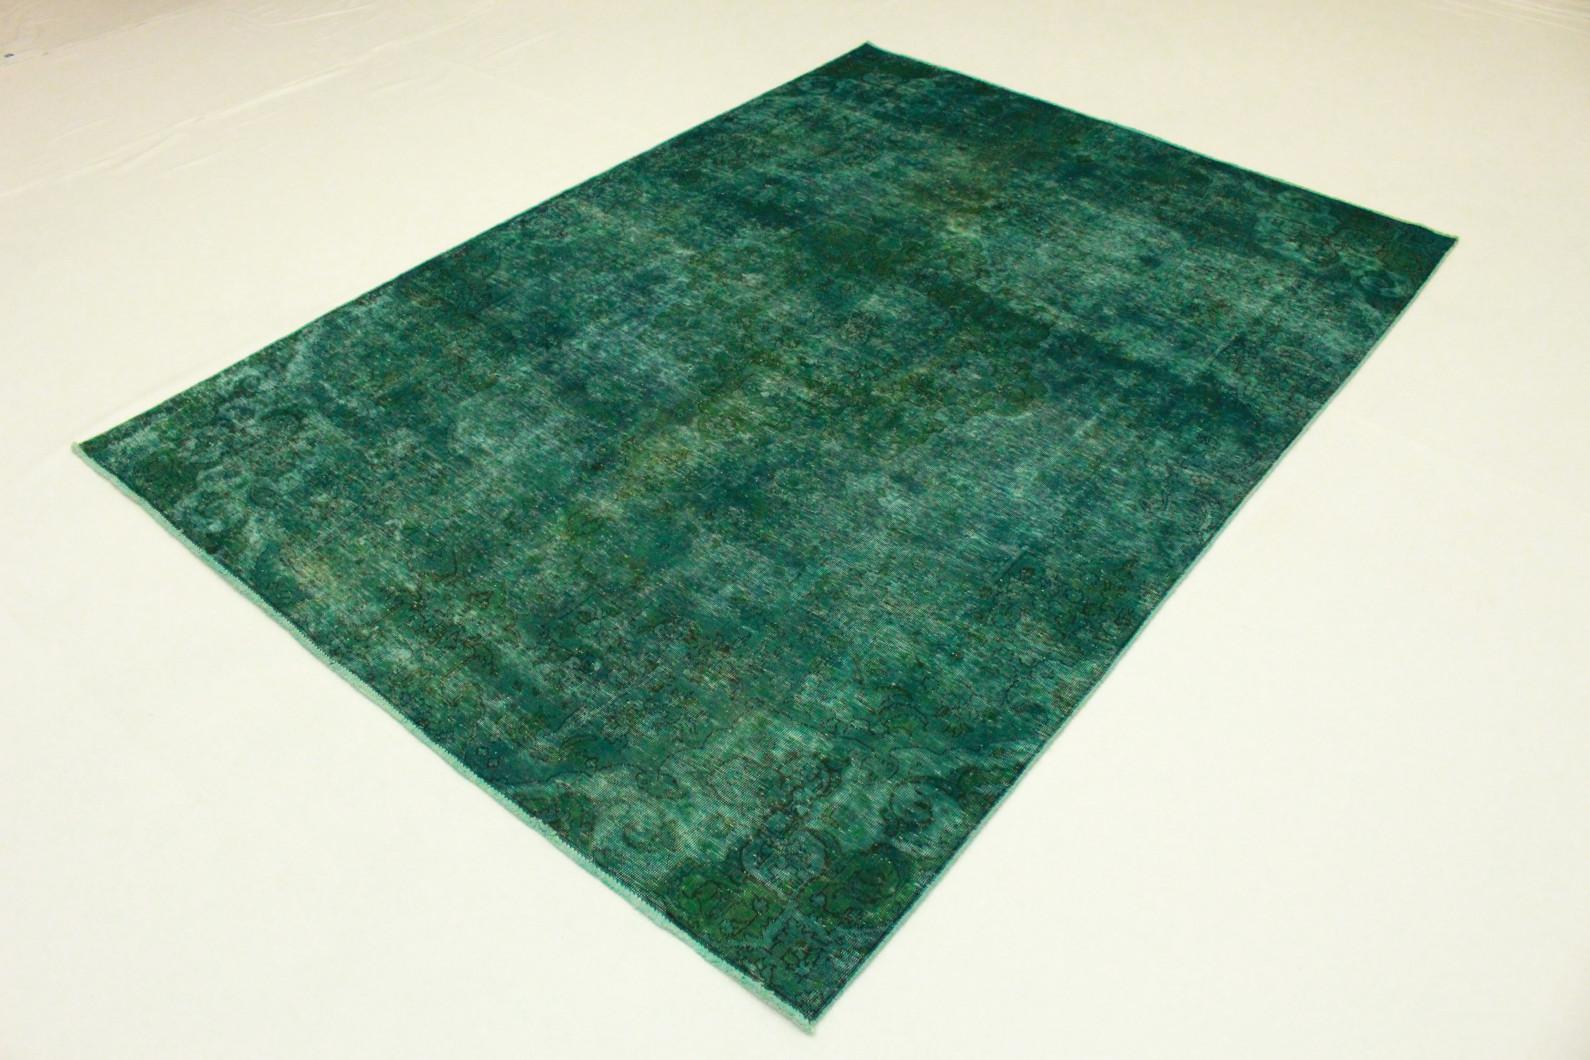 vintage teppich gr n t rkis in 290x210 1001 3547 bei kaufen. Black Bedroom Furniture Sets. Home Design Ideas